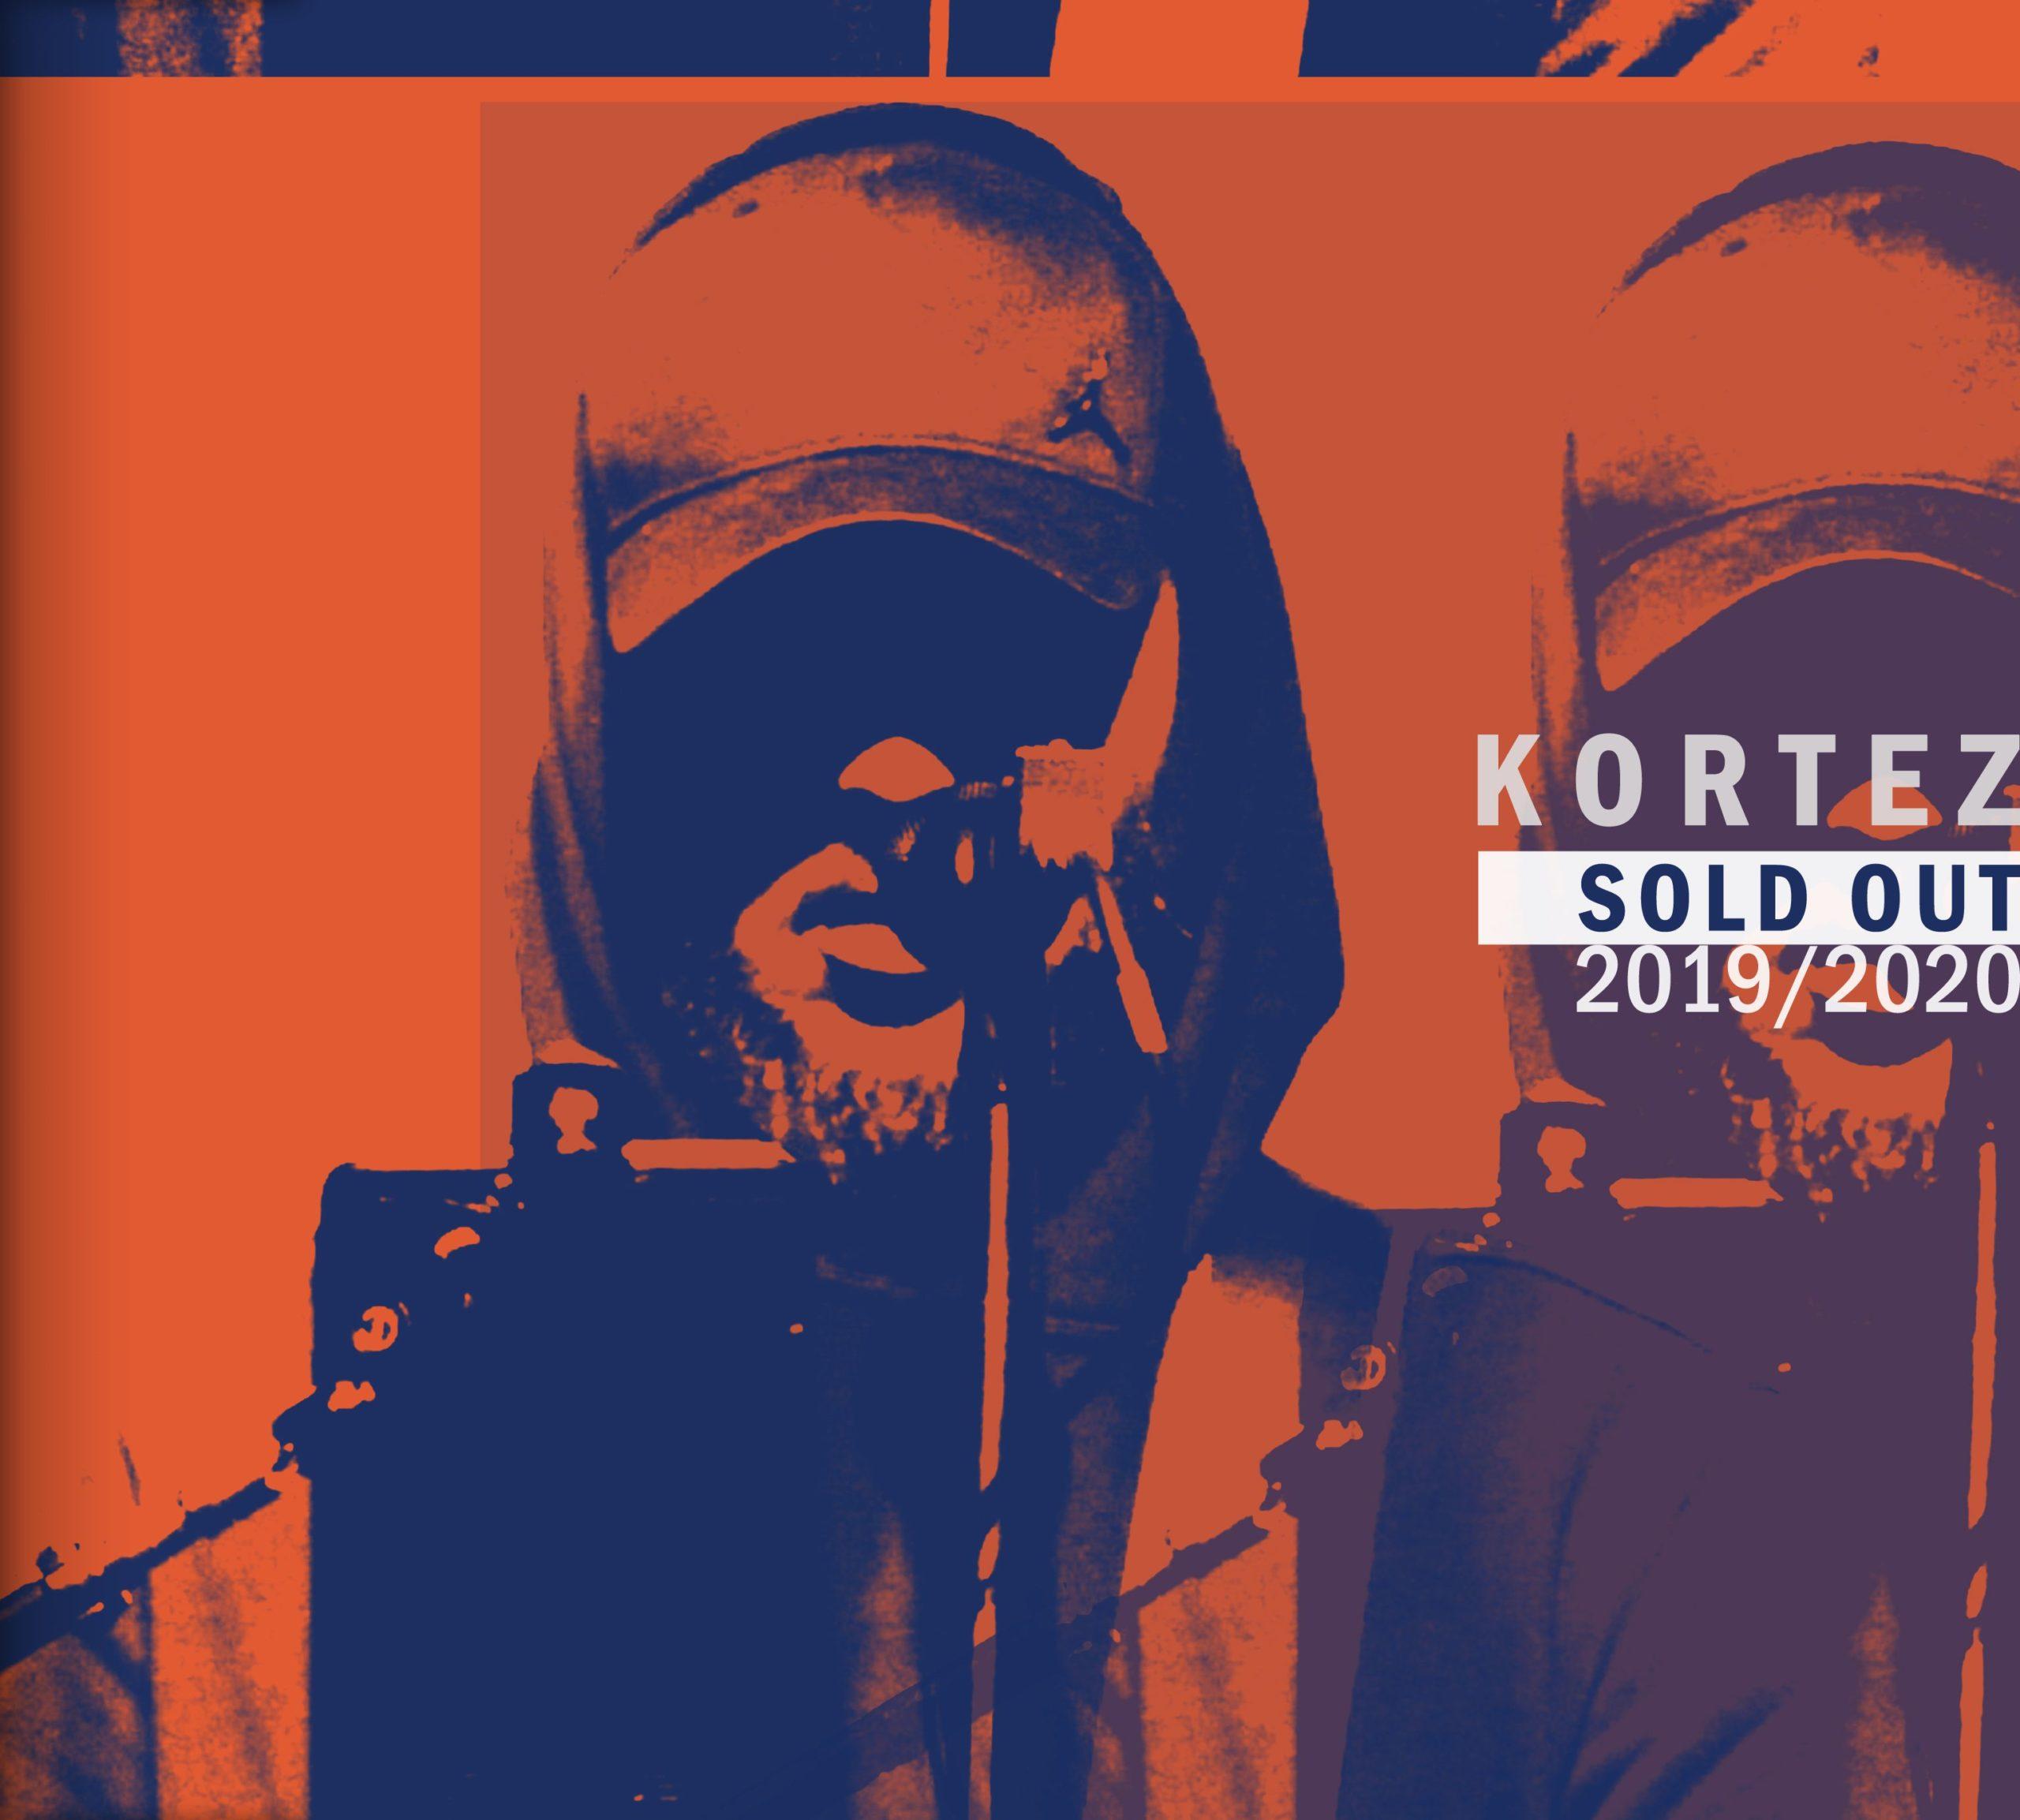 Kortez – Sold Out